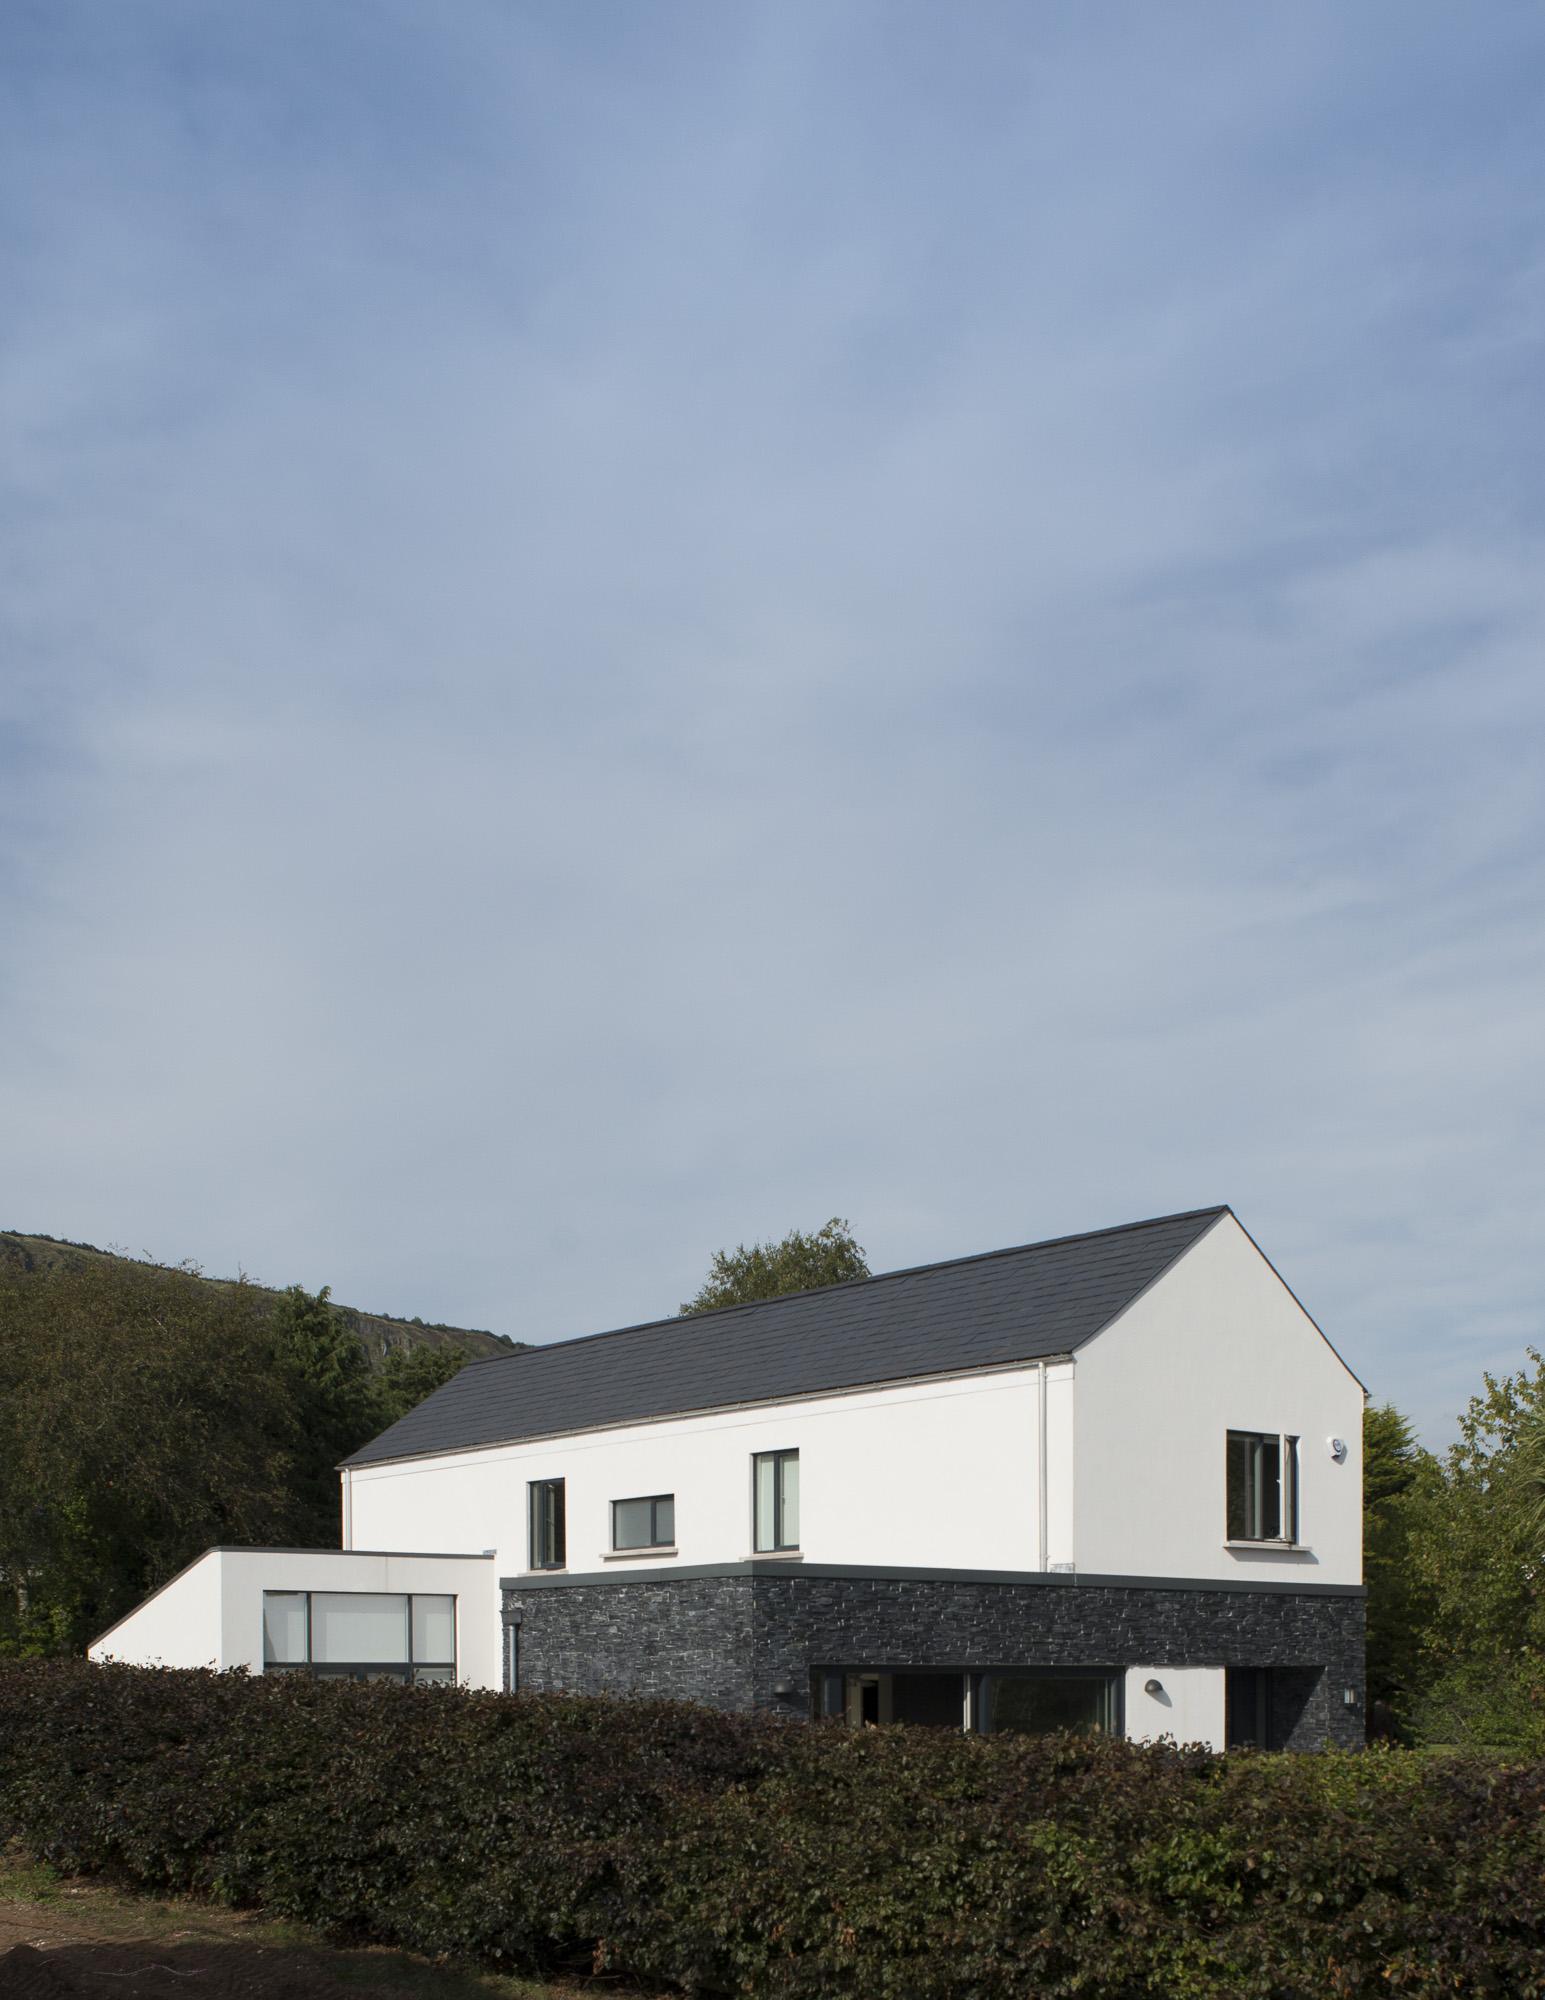 Greenisland House - Architectural Photographer